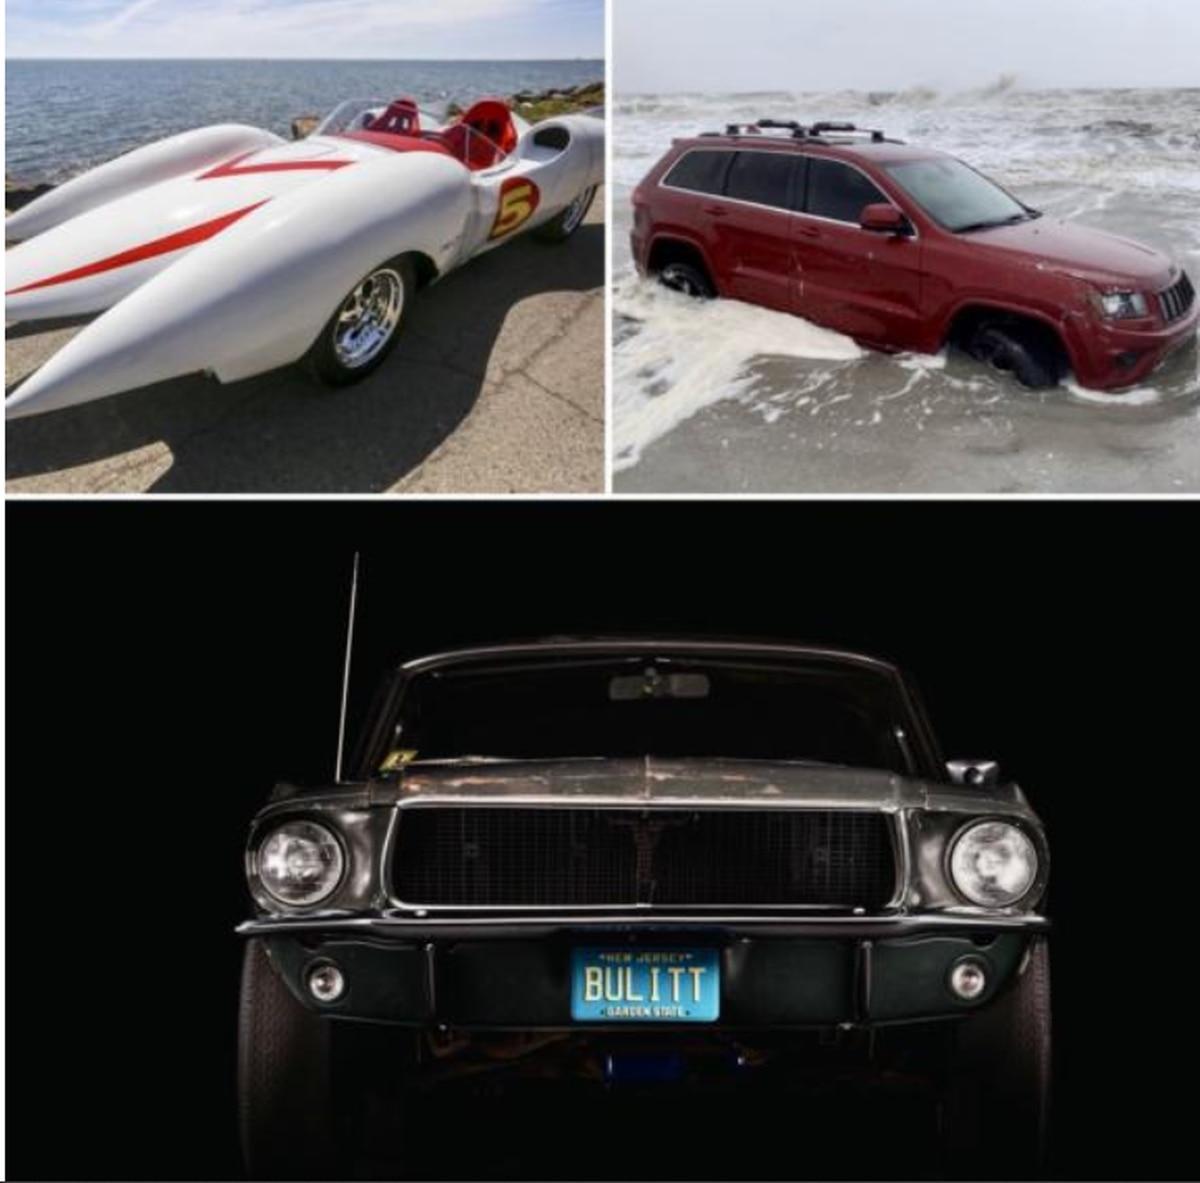 Food Lion Auto Fair 2020.Bullitt Mustang And Hurricane Dorian Jeep Headline Star